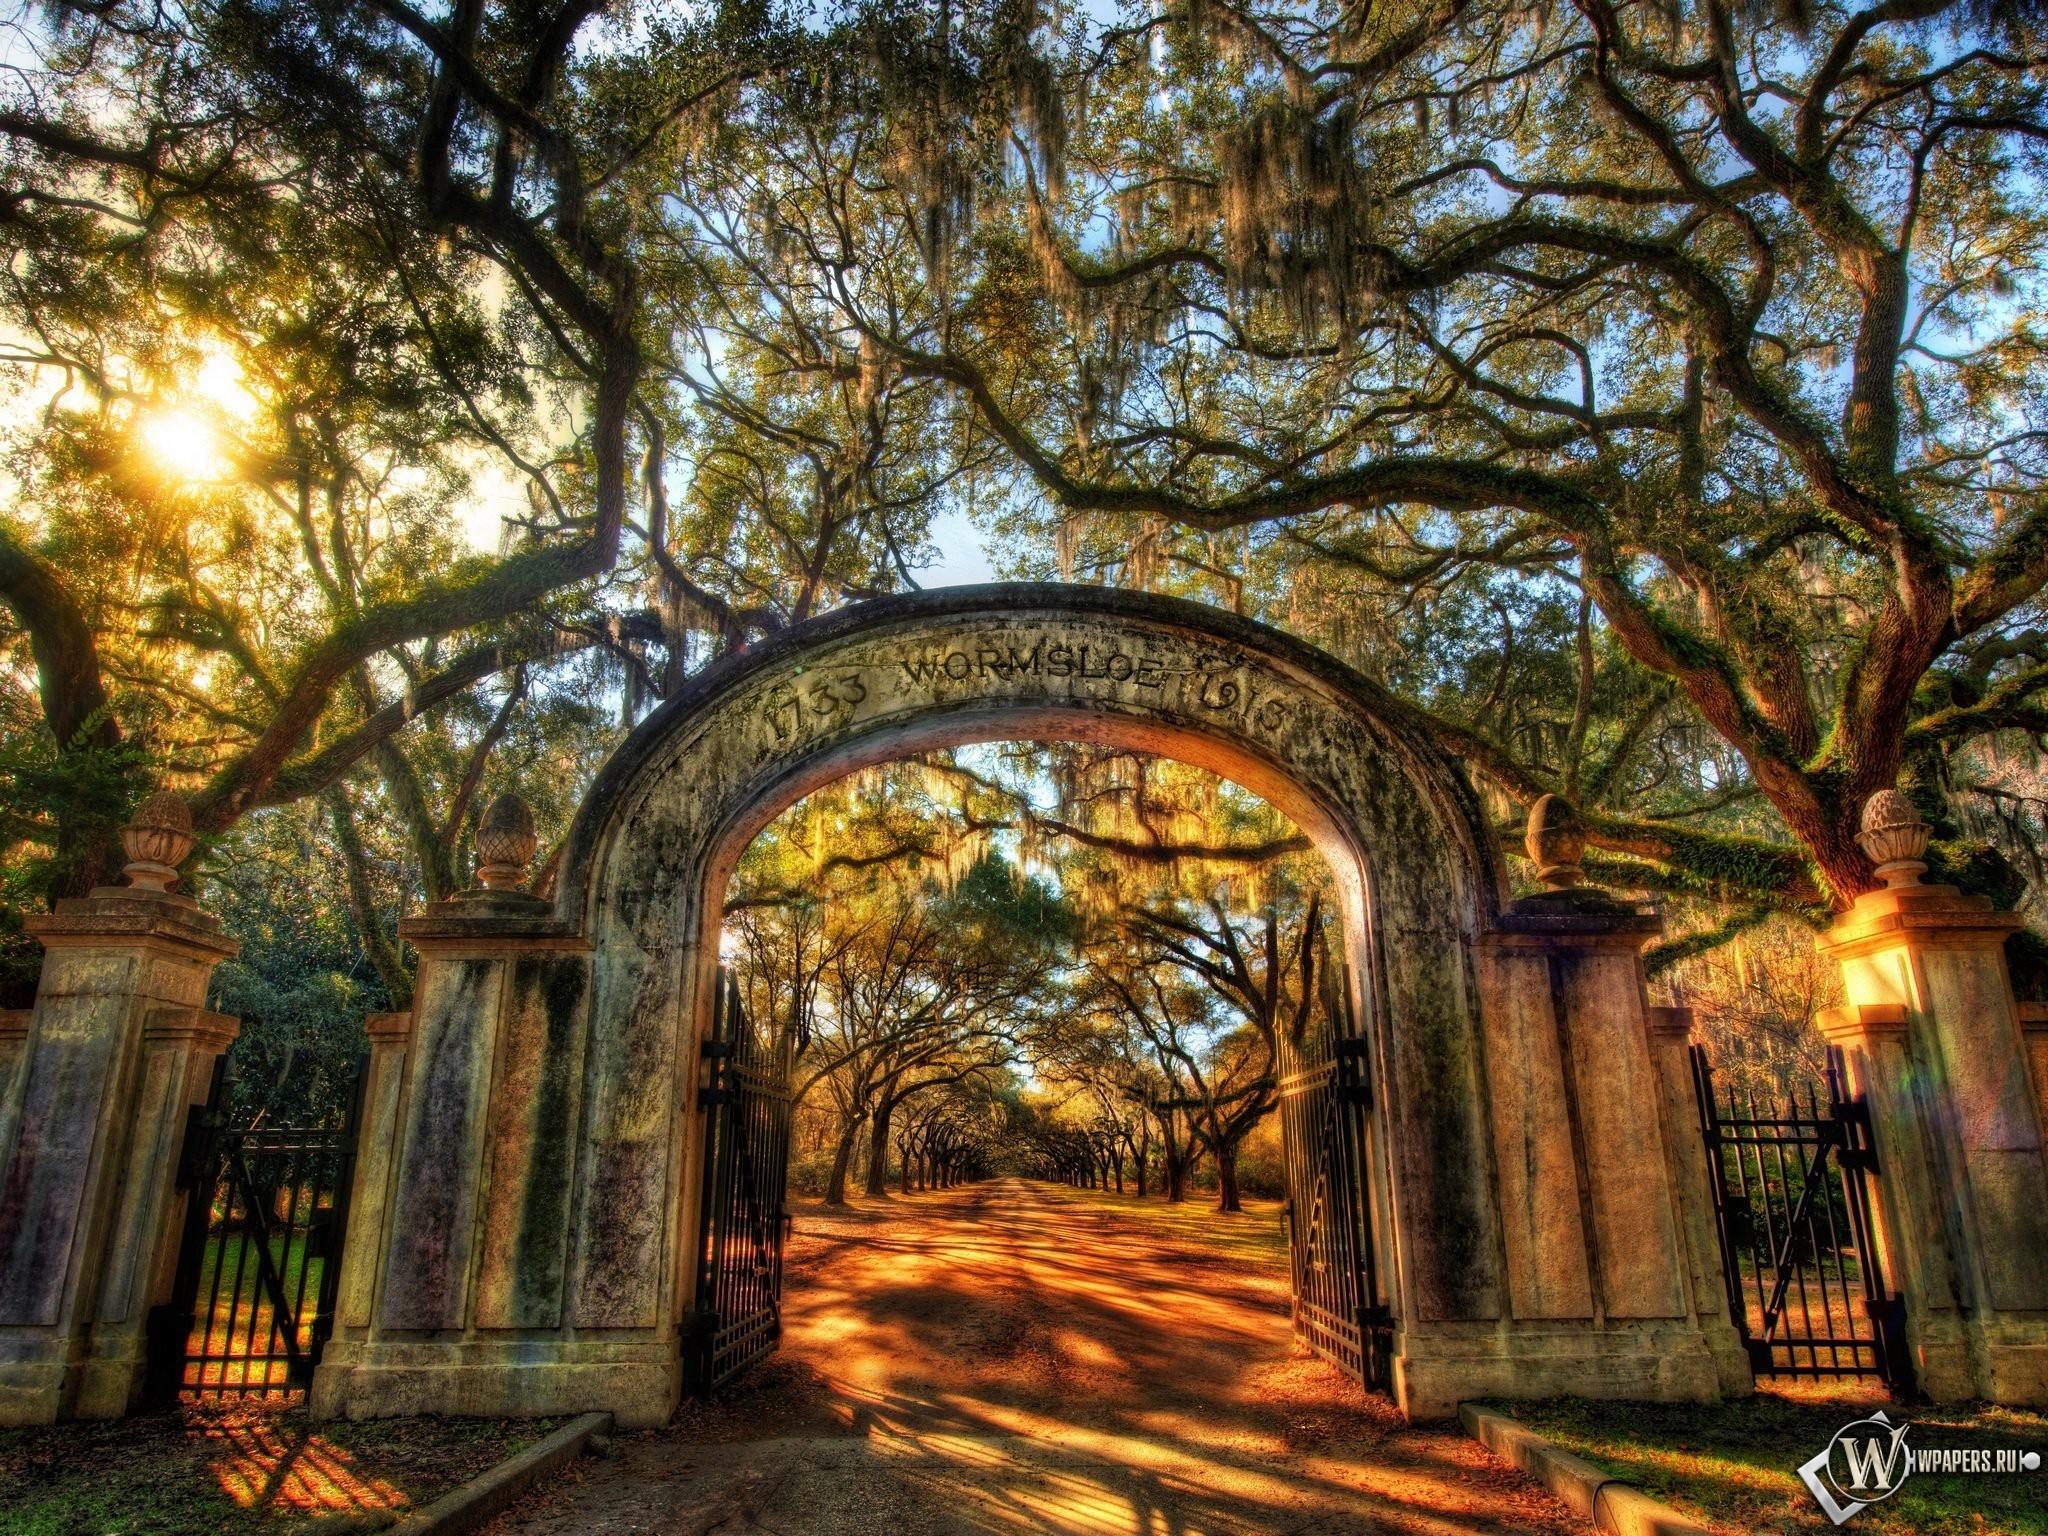 Ворота в парк 2048x1536